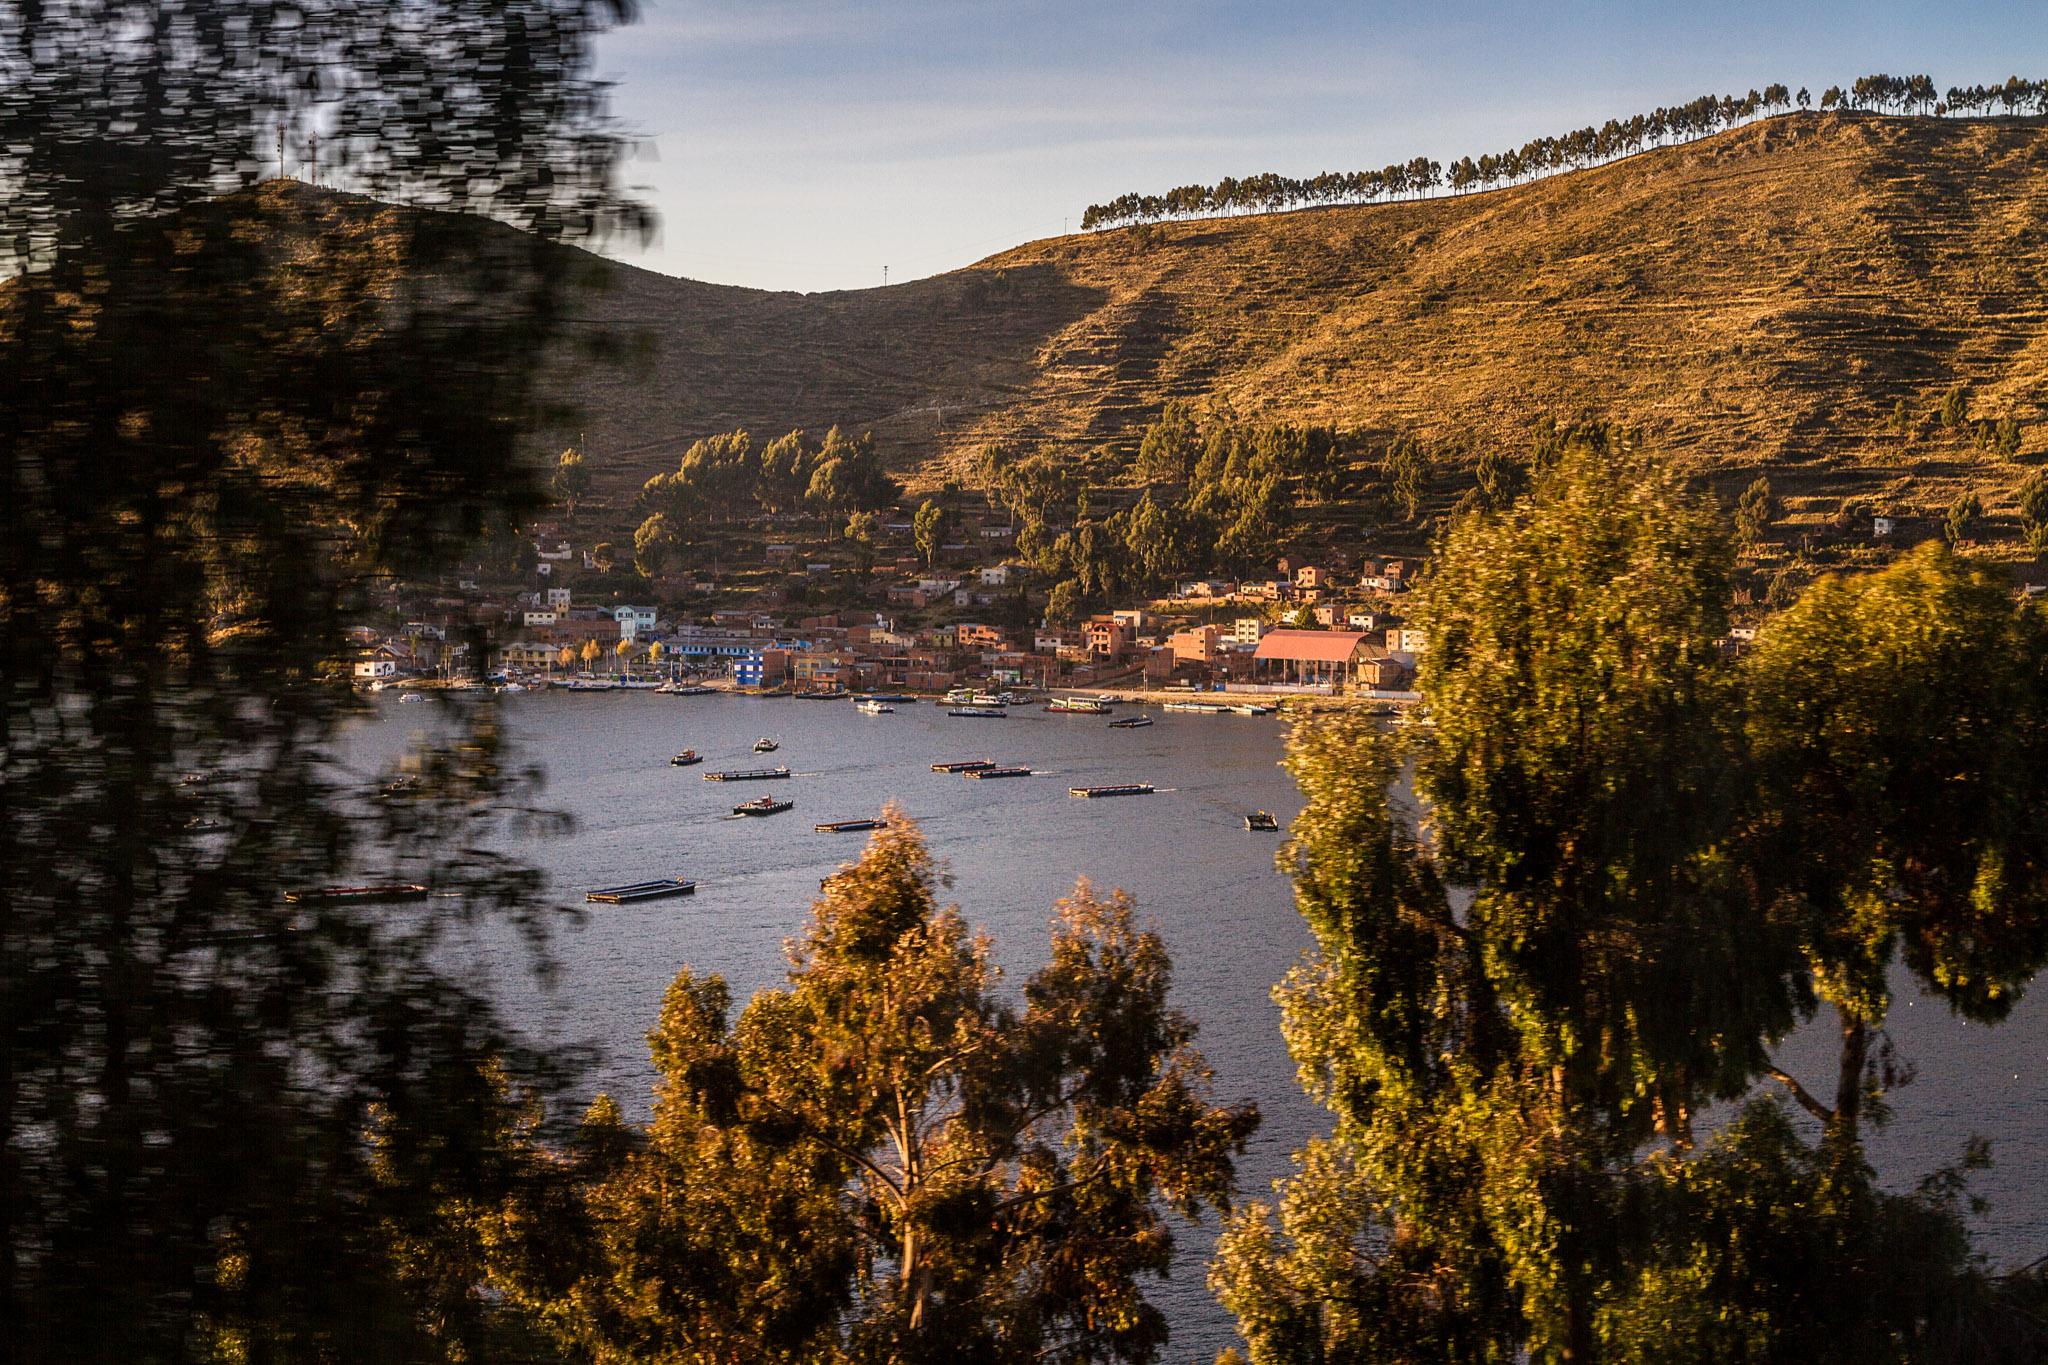 Ali-Barqawi-Studios-Explore-Series-Travel-Adventure-Documentary-C4CGAZA-Bolivia-Lake-Titicaca-2015-095.jpg